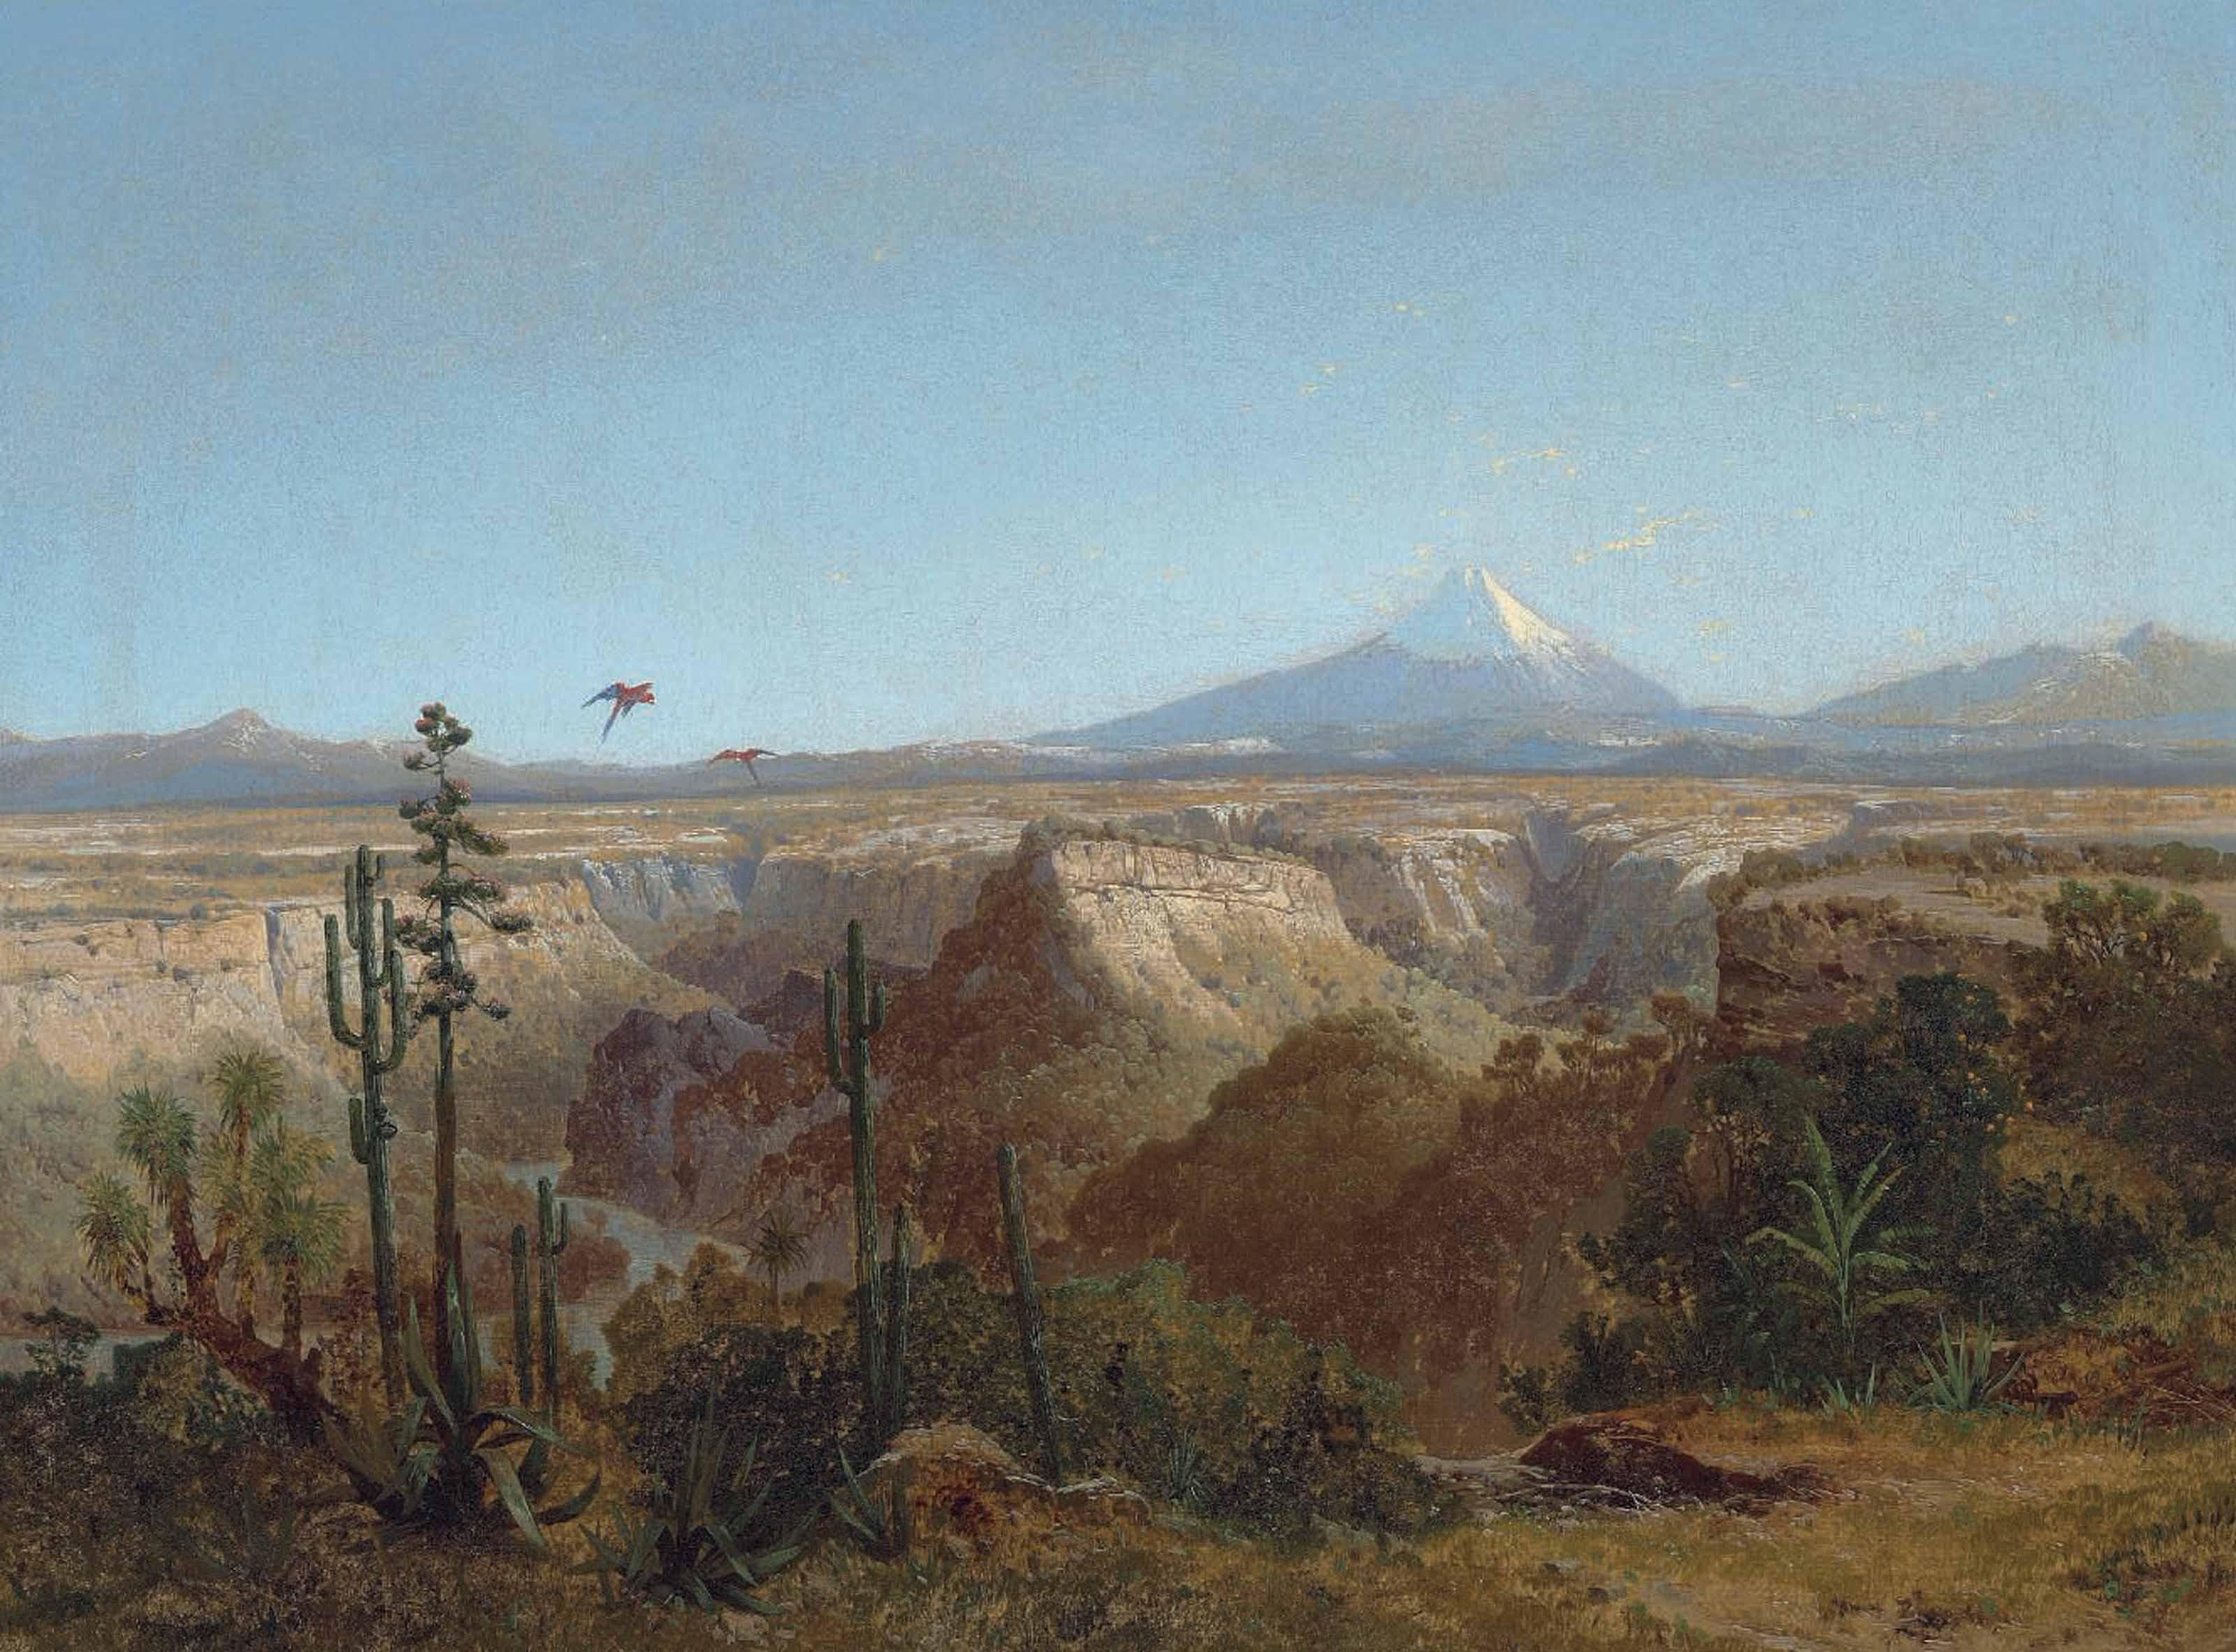 The Atacama desert, Chile, with the Licancabur volcano beyond